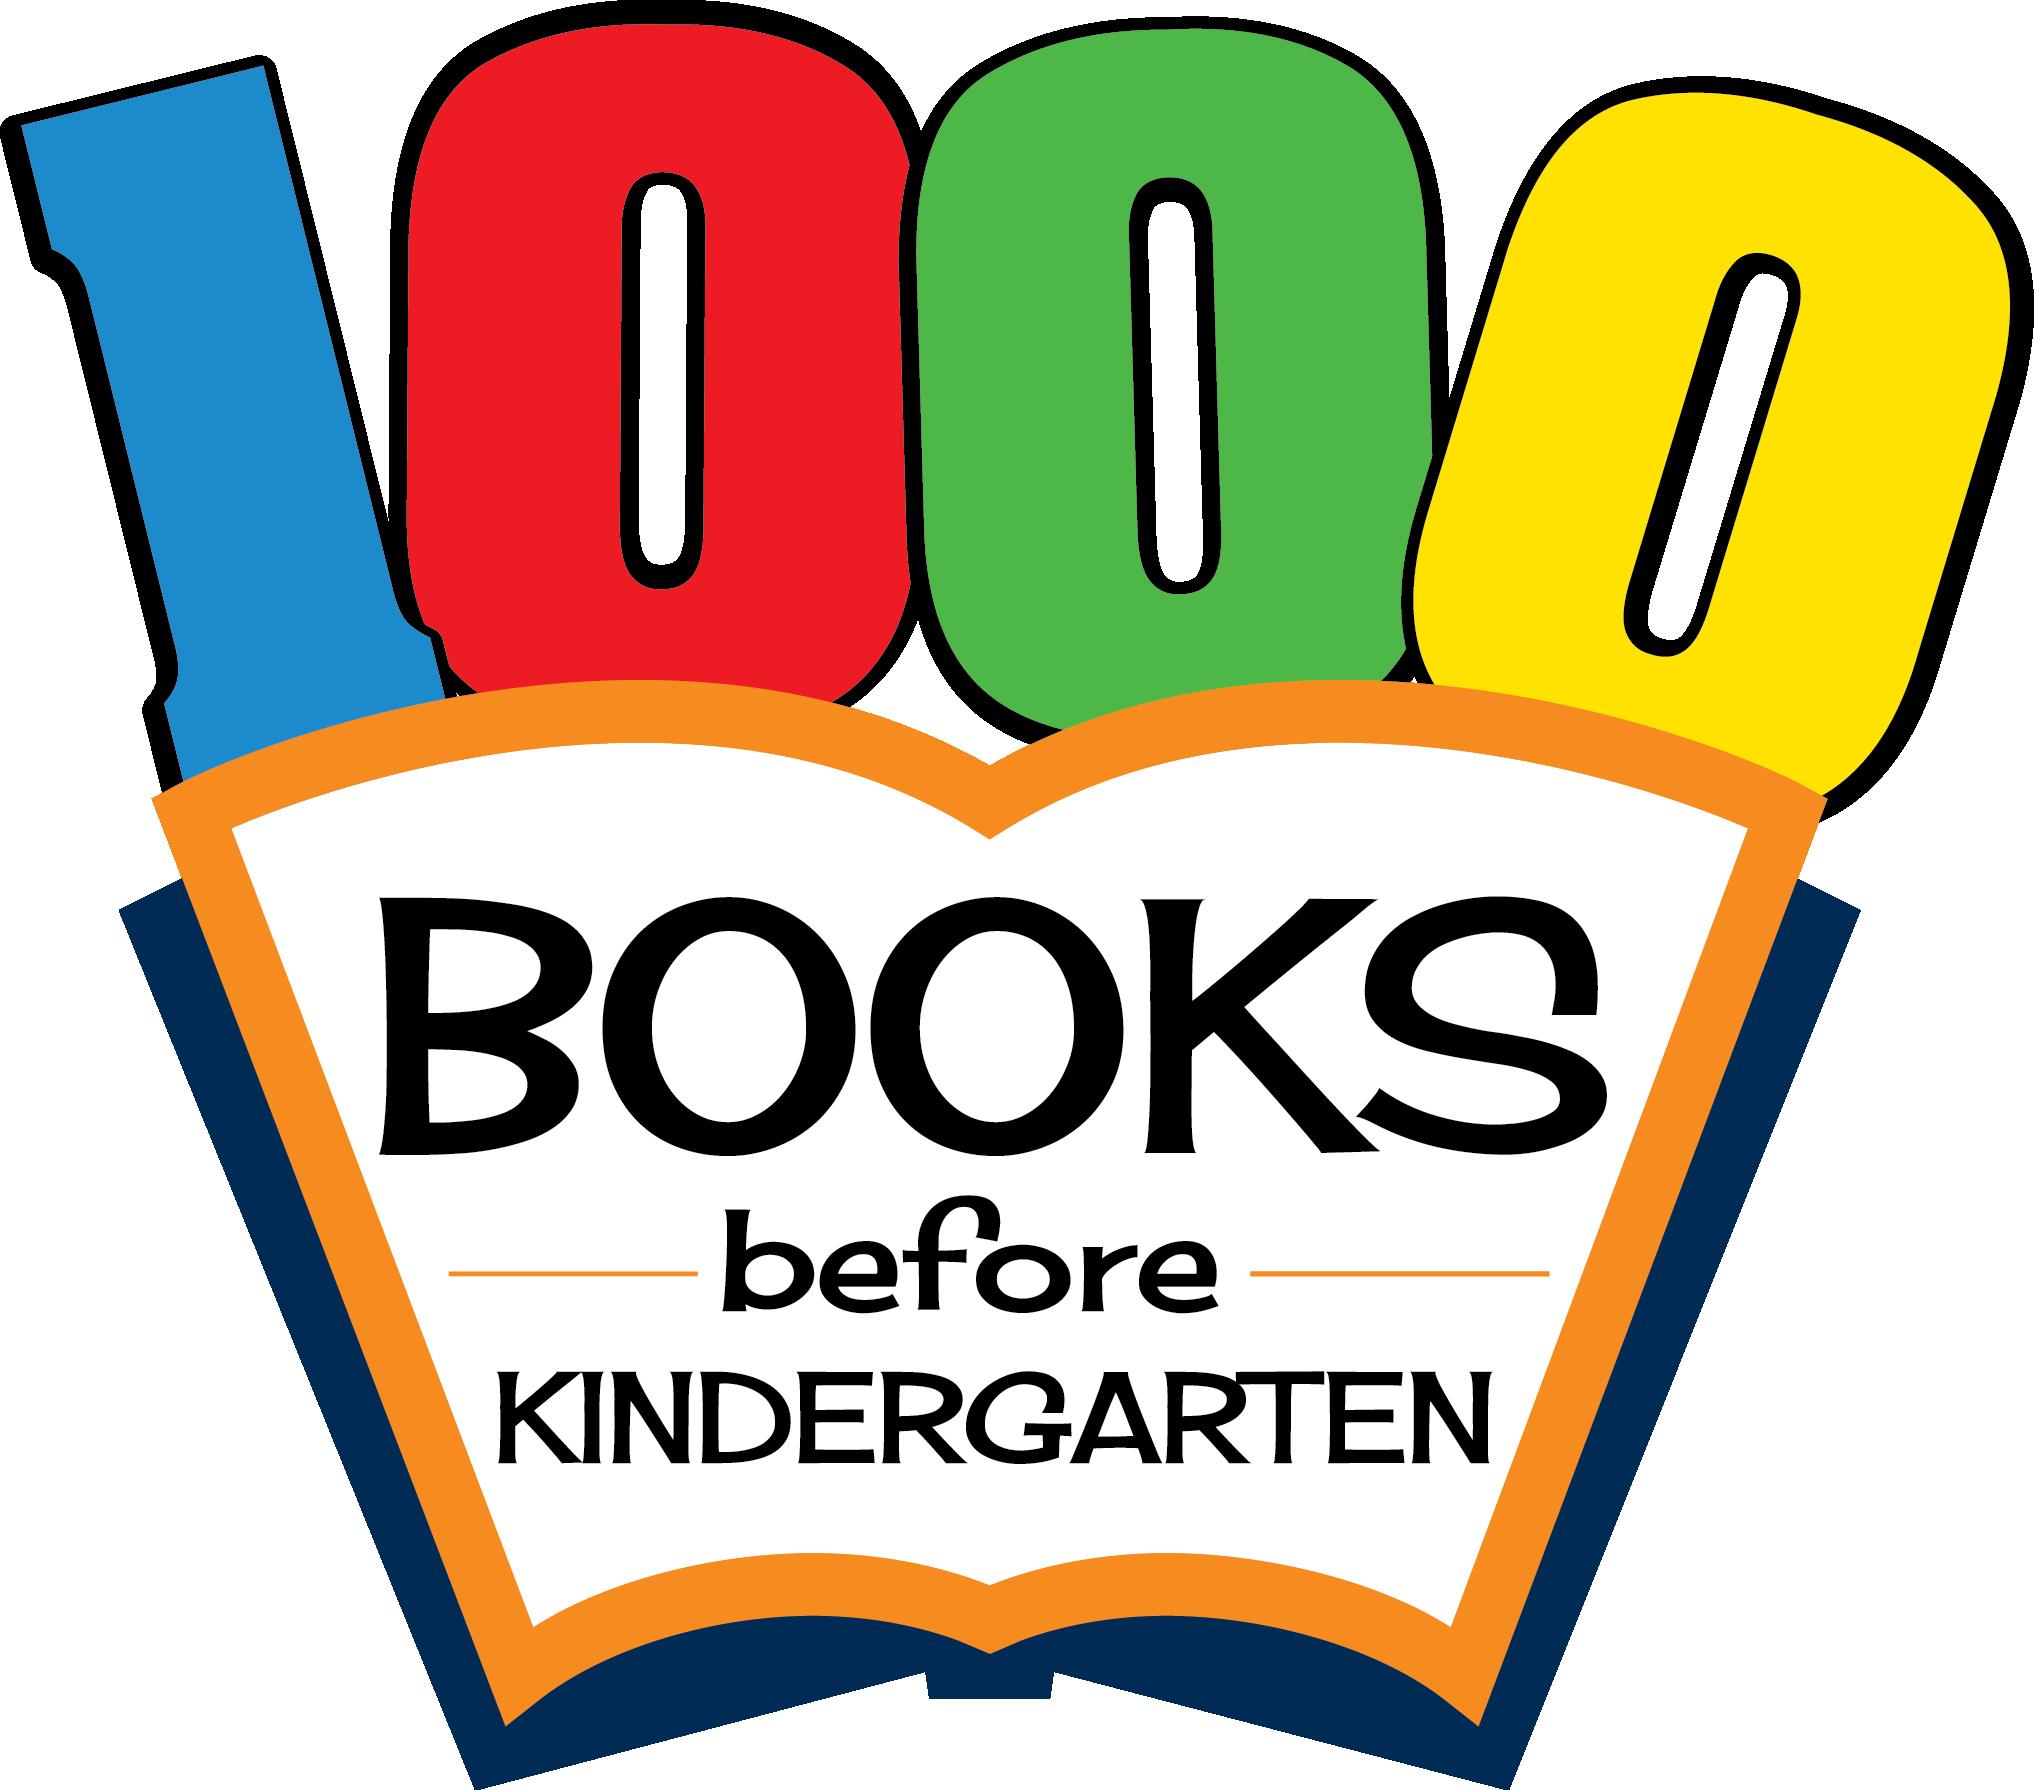 Library clipart kindergarten.  books before grafton